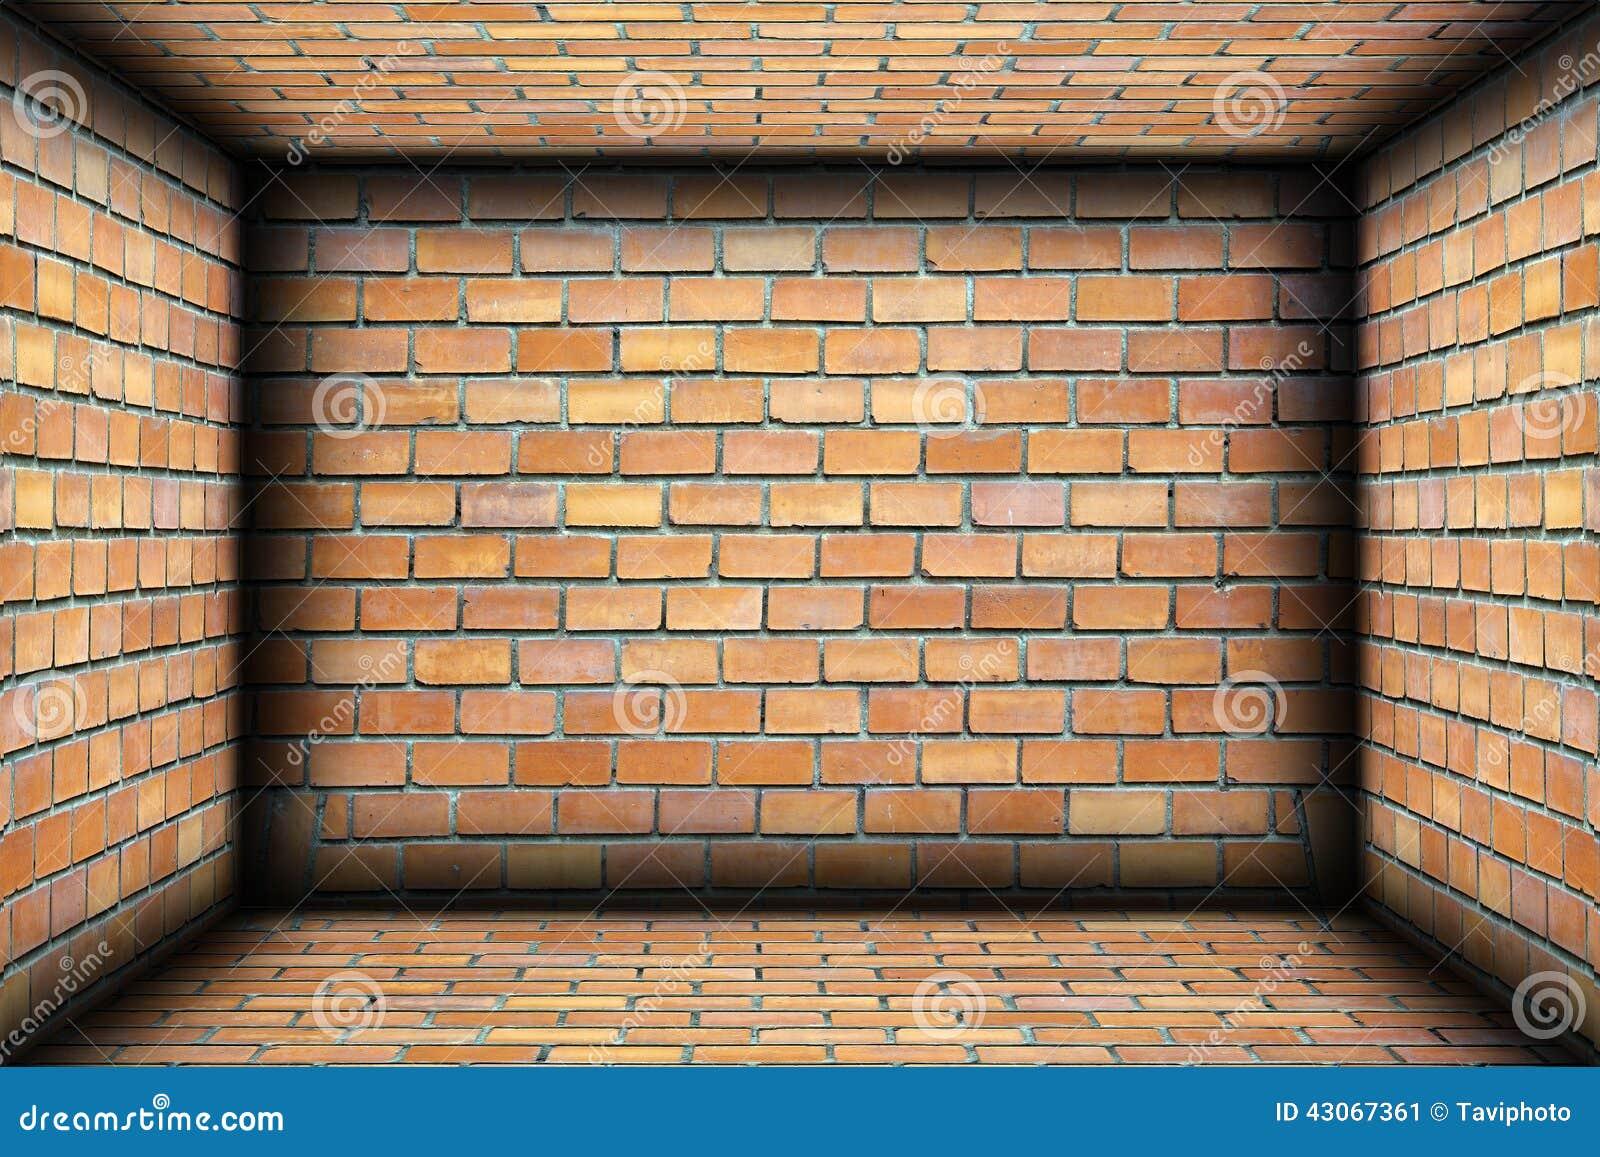 brick walls. Brick Walls On Interior Architectural Backdrop